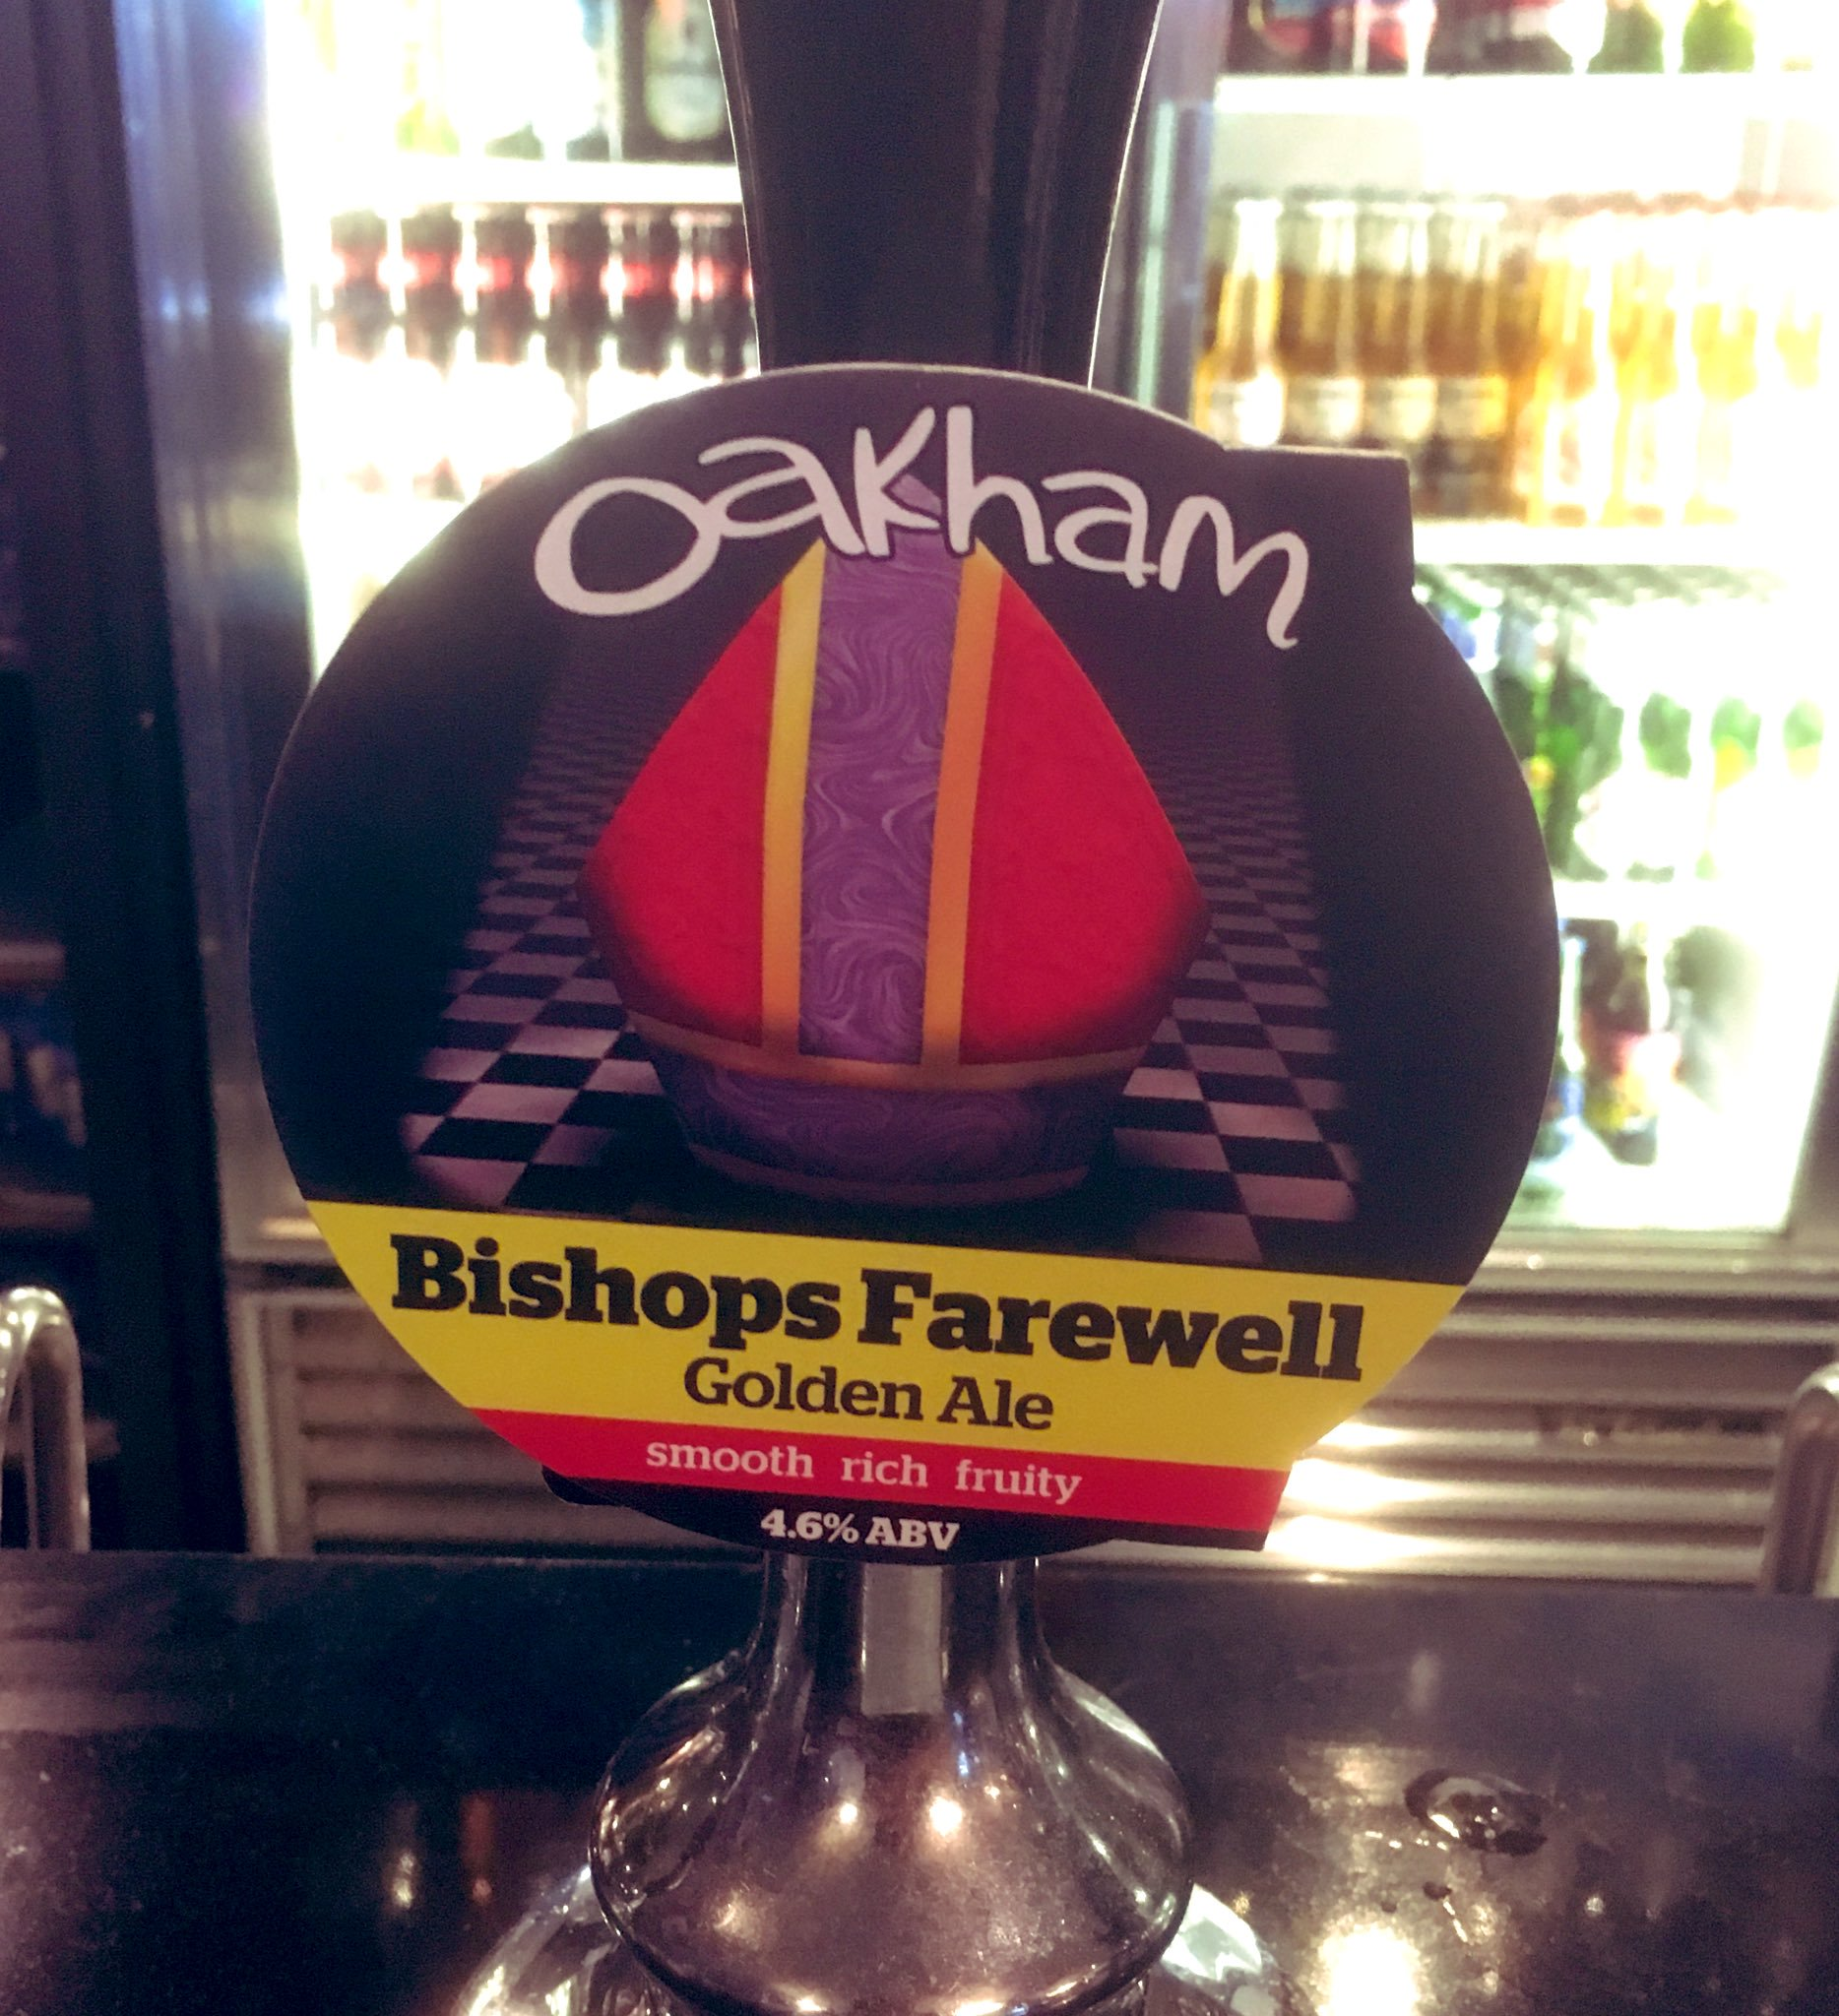 274: Bishops Farewell